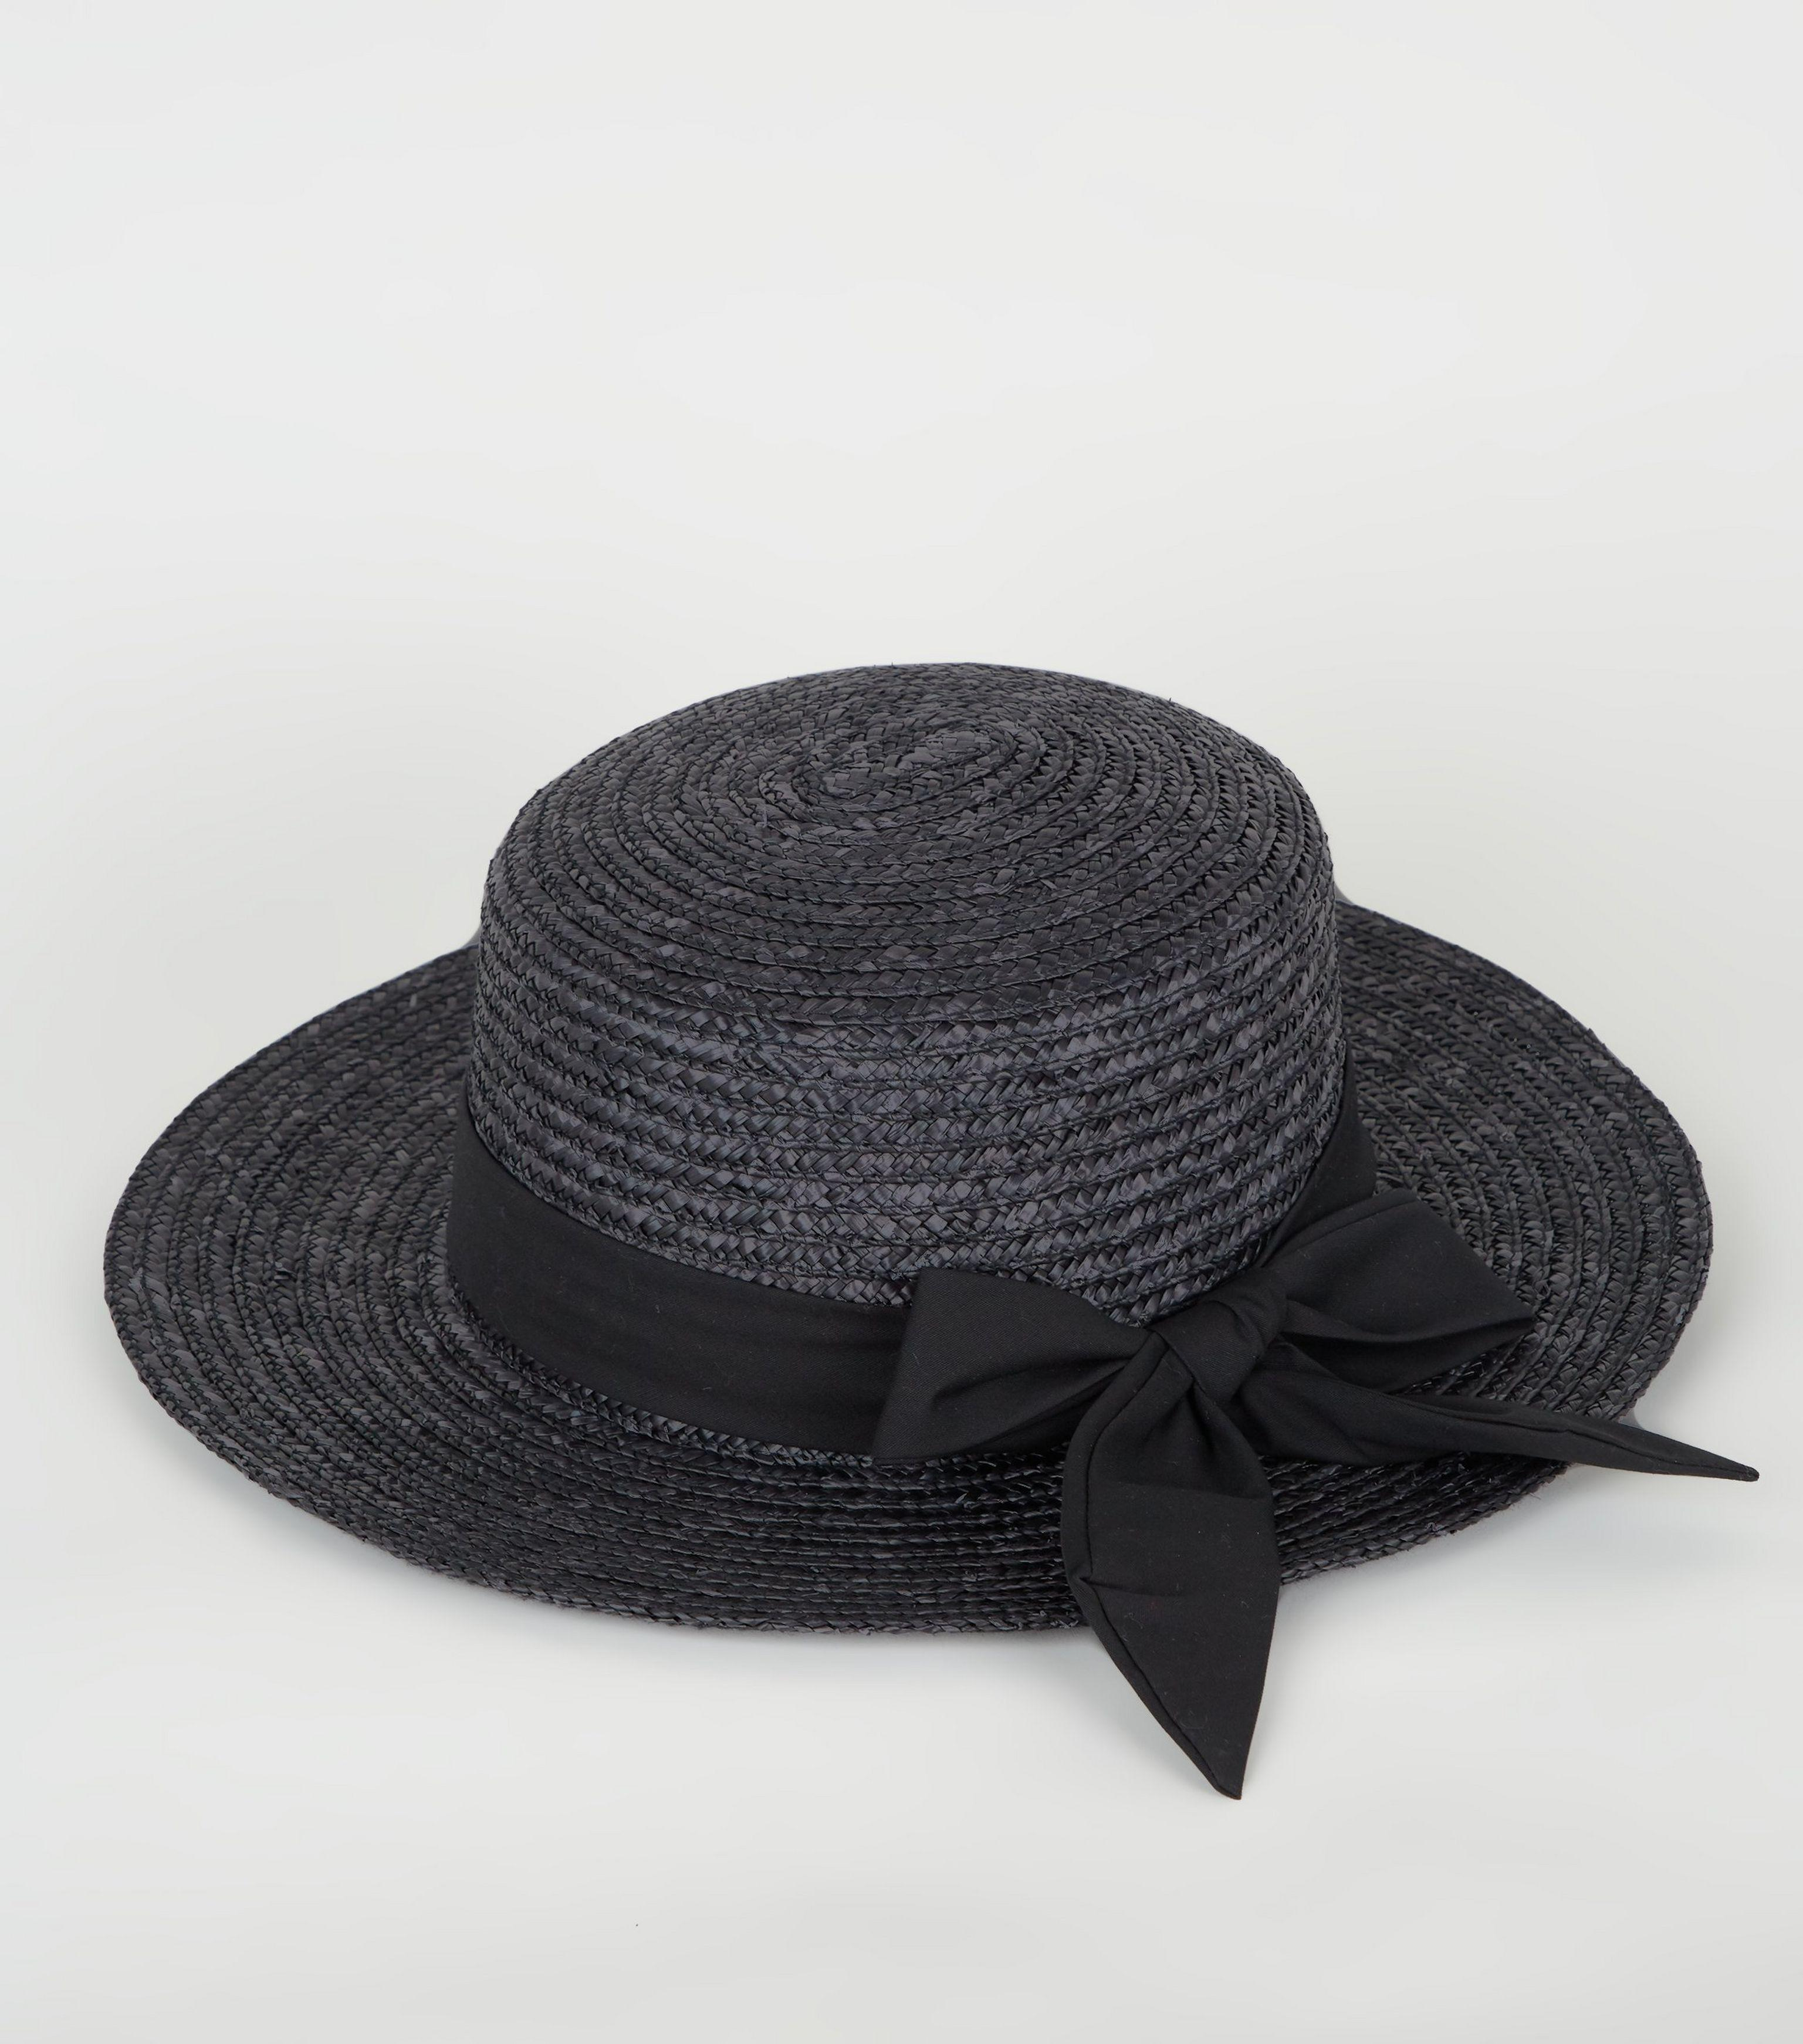 4e04ecb6086 New Look Black Straw Boater Hat in Black - Lyst